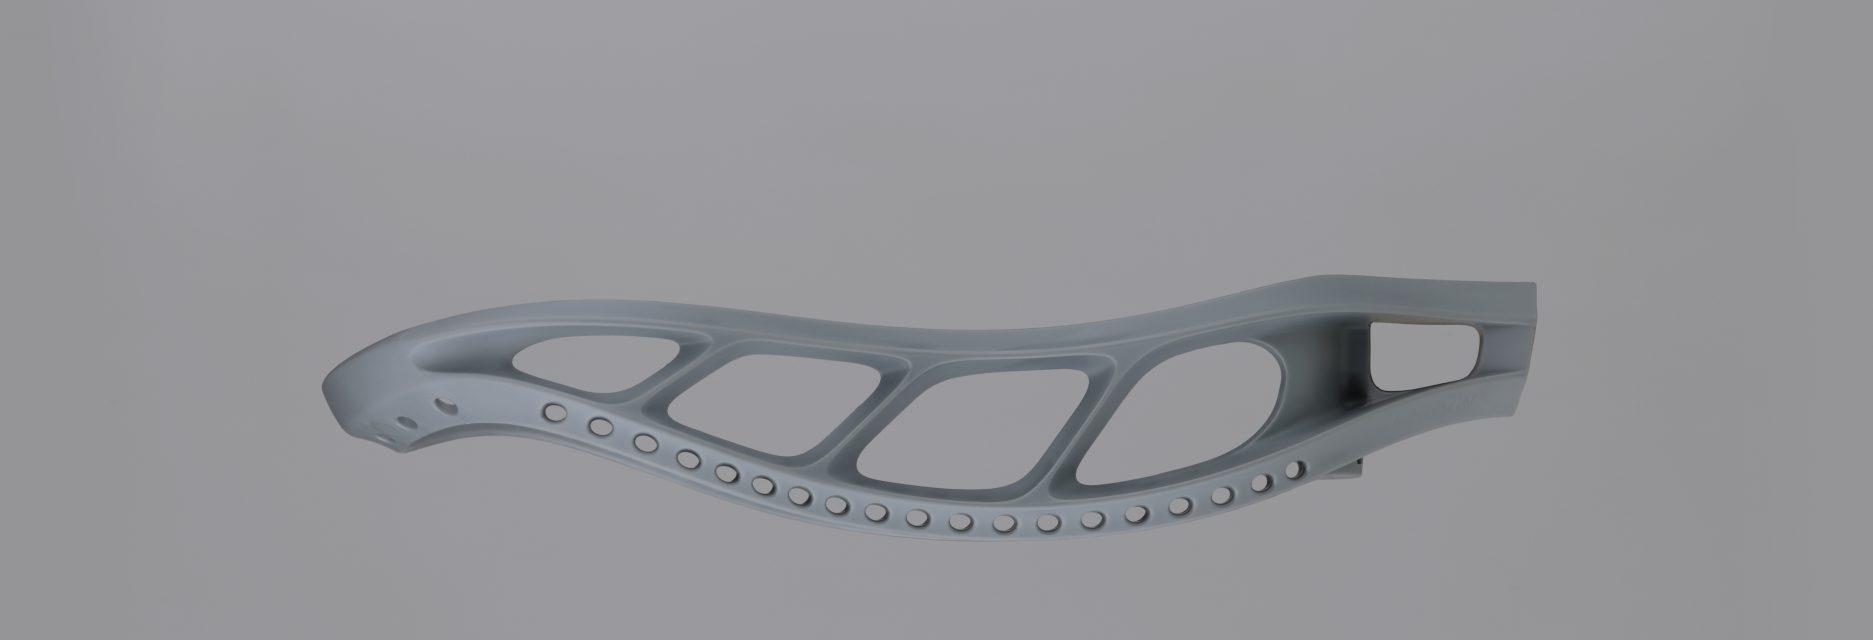 StringKing Mark 1 Lacrosse Head Style